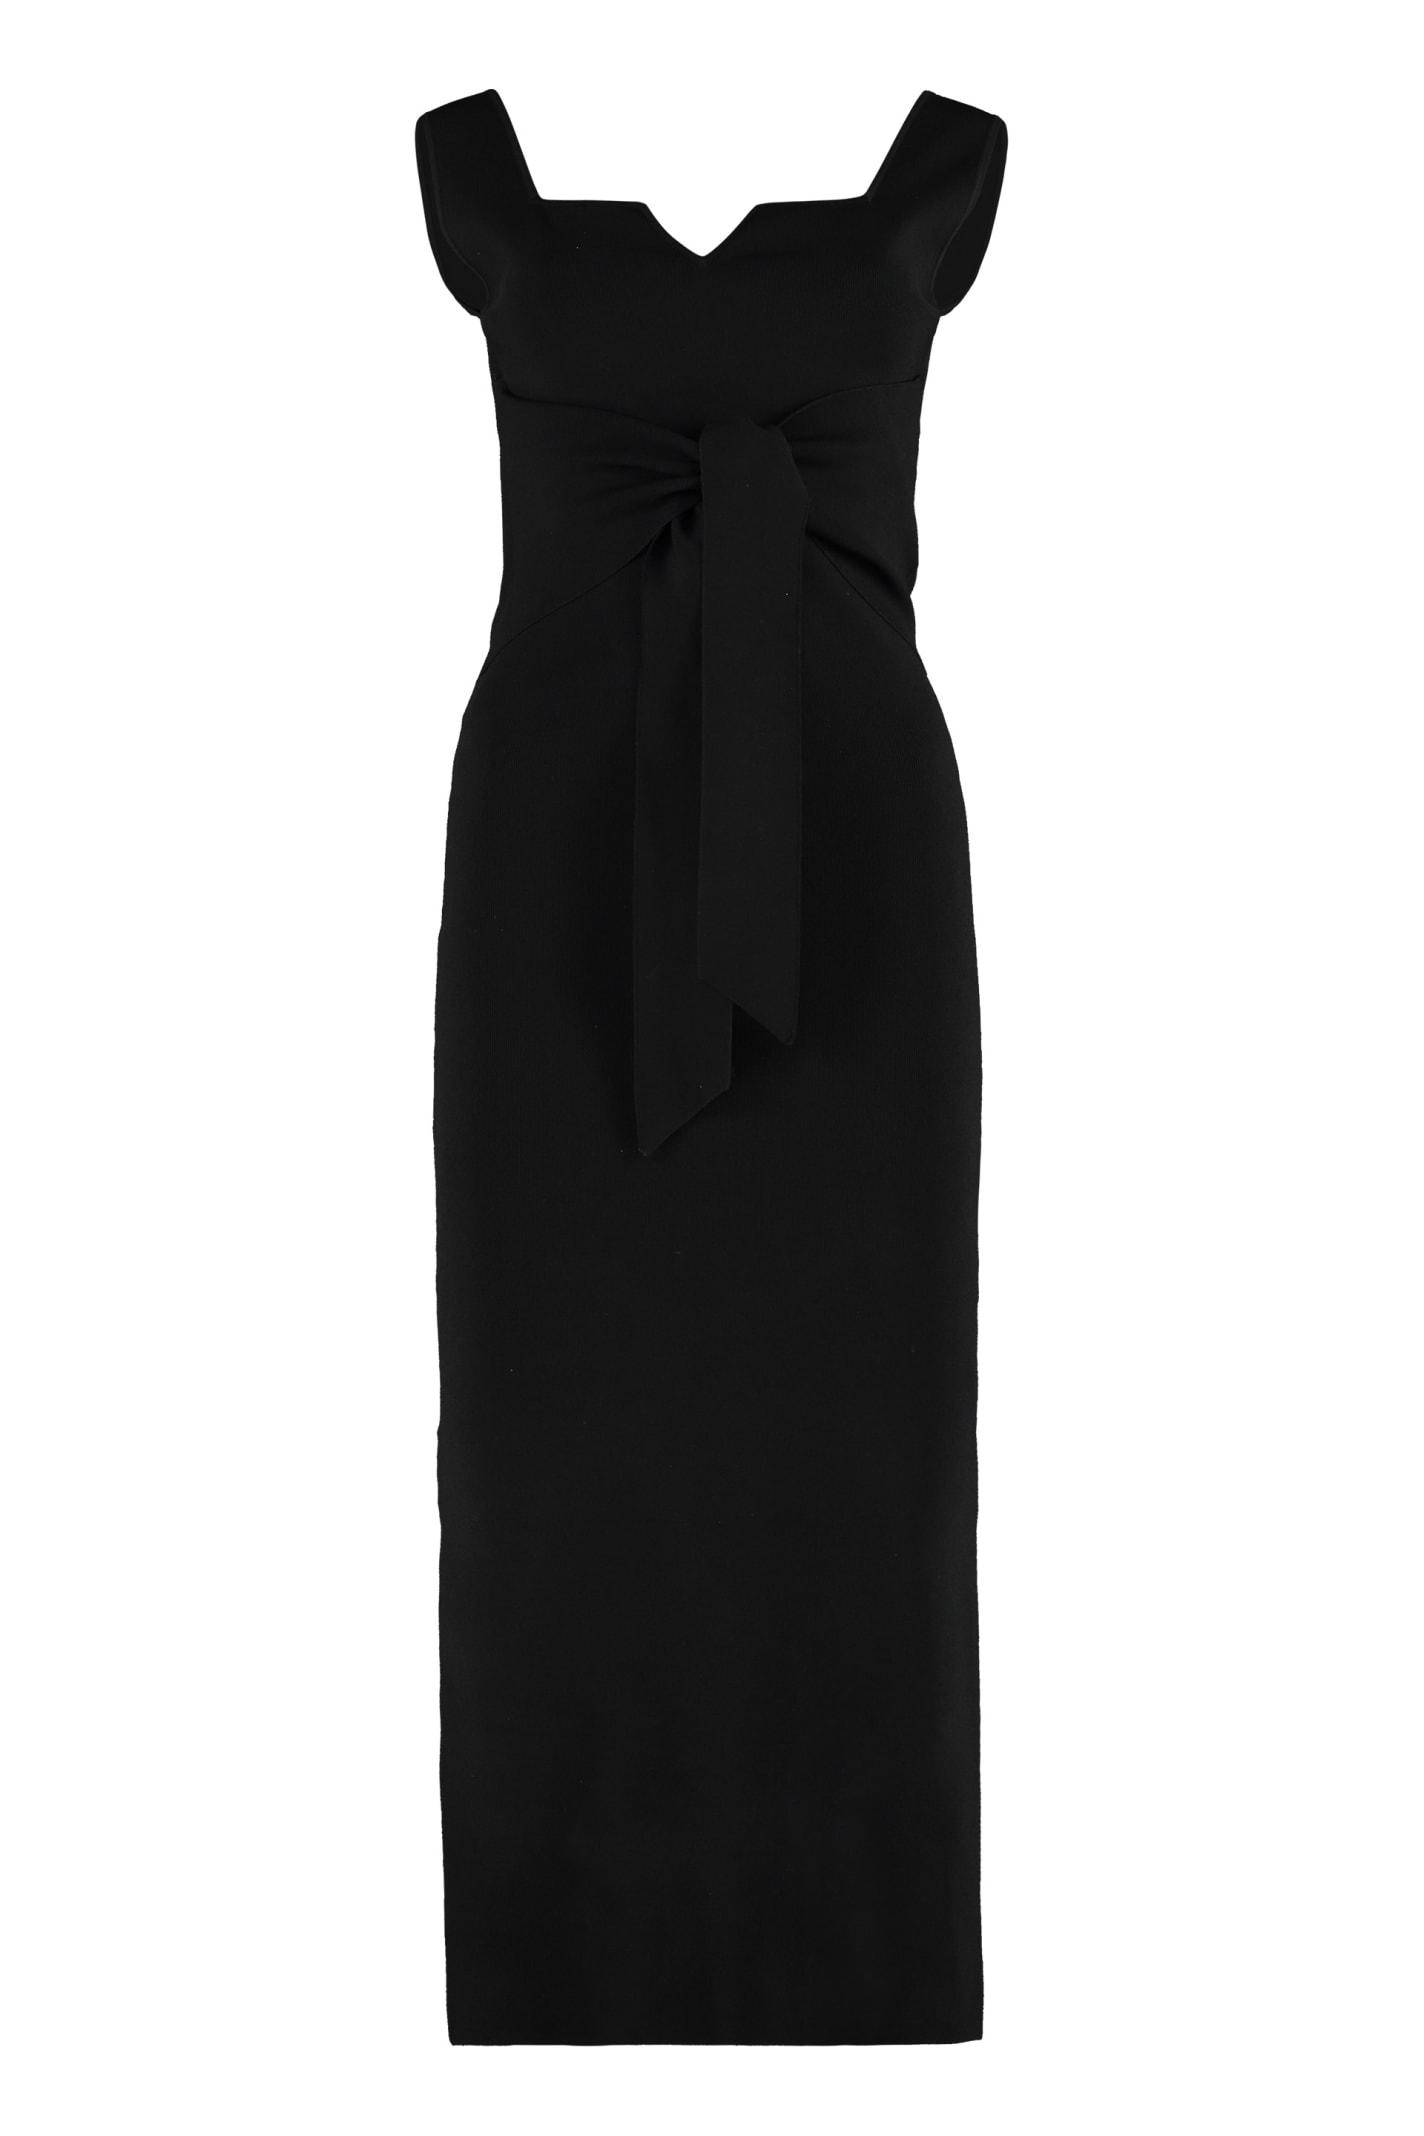 Buy Nanushka Melon Ribbed Knit Dress online, shop Nanushka with free shipping